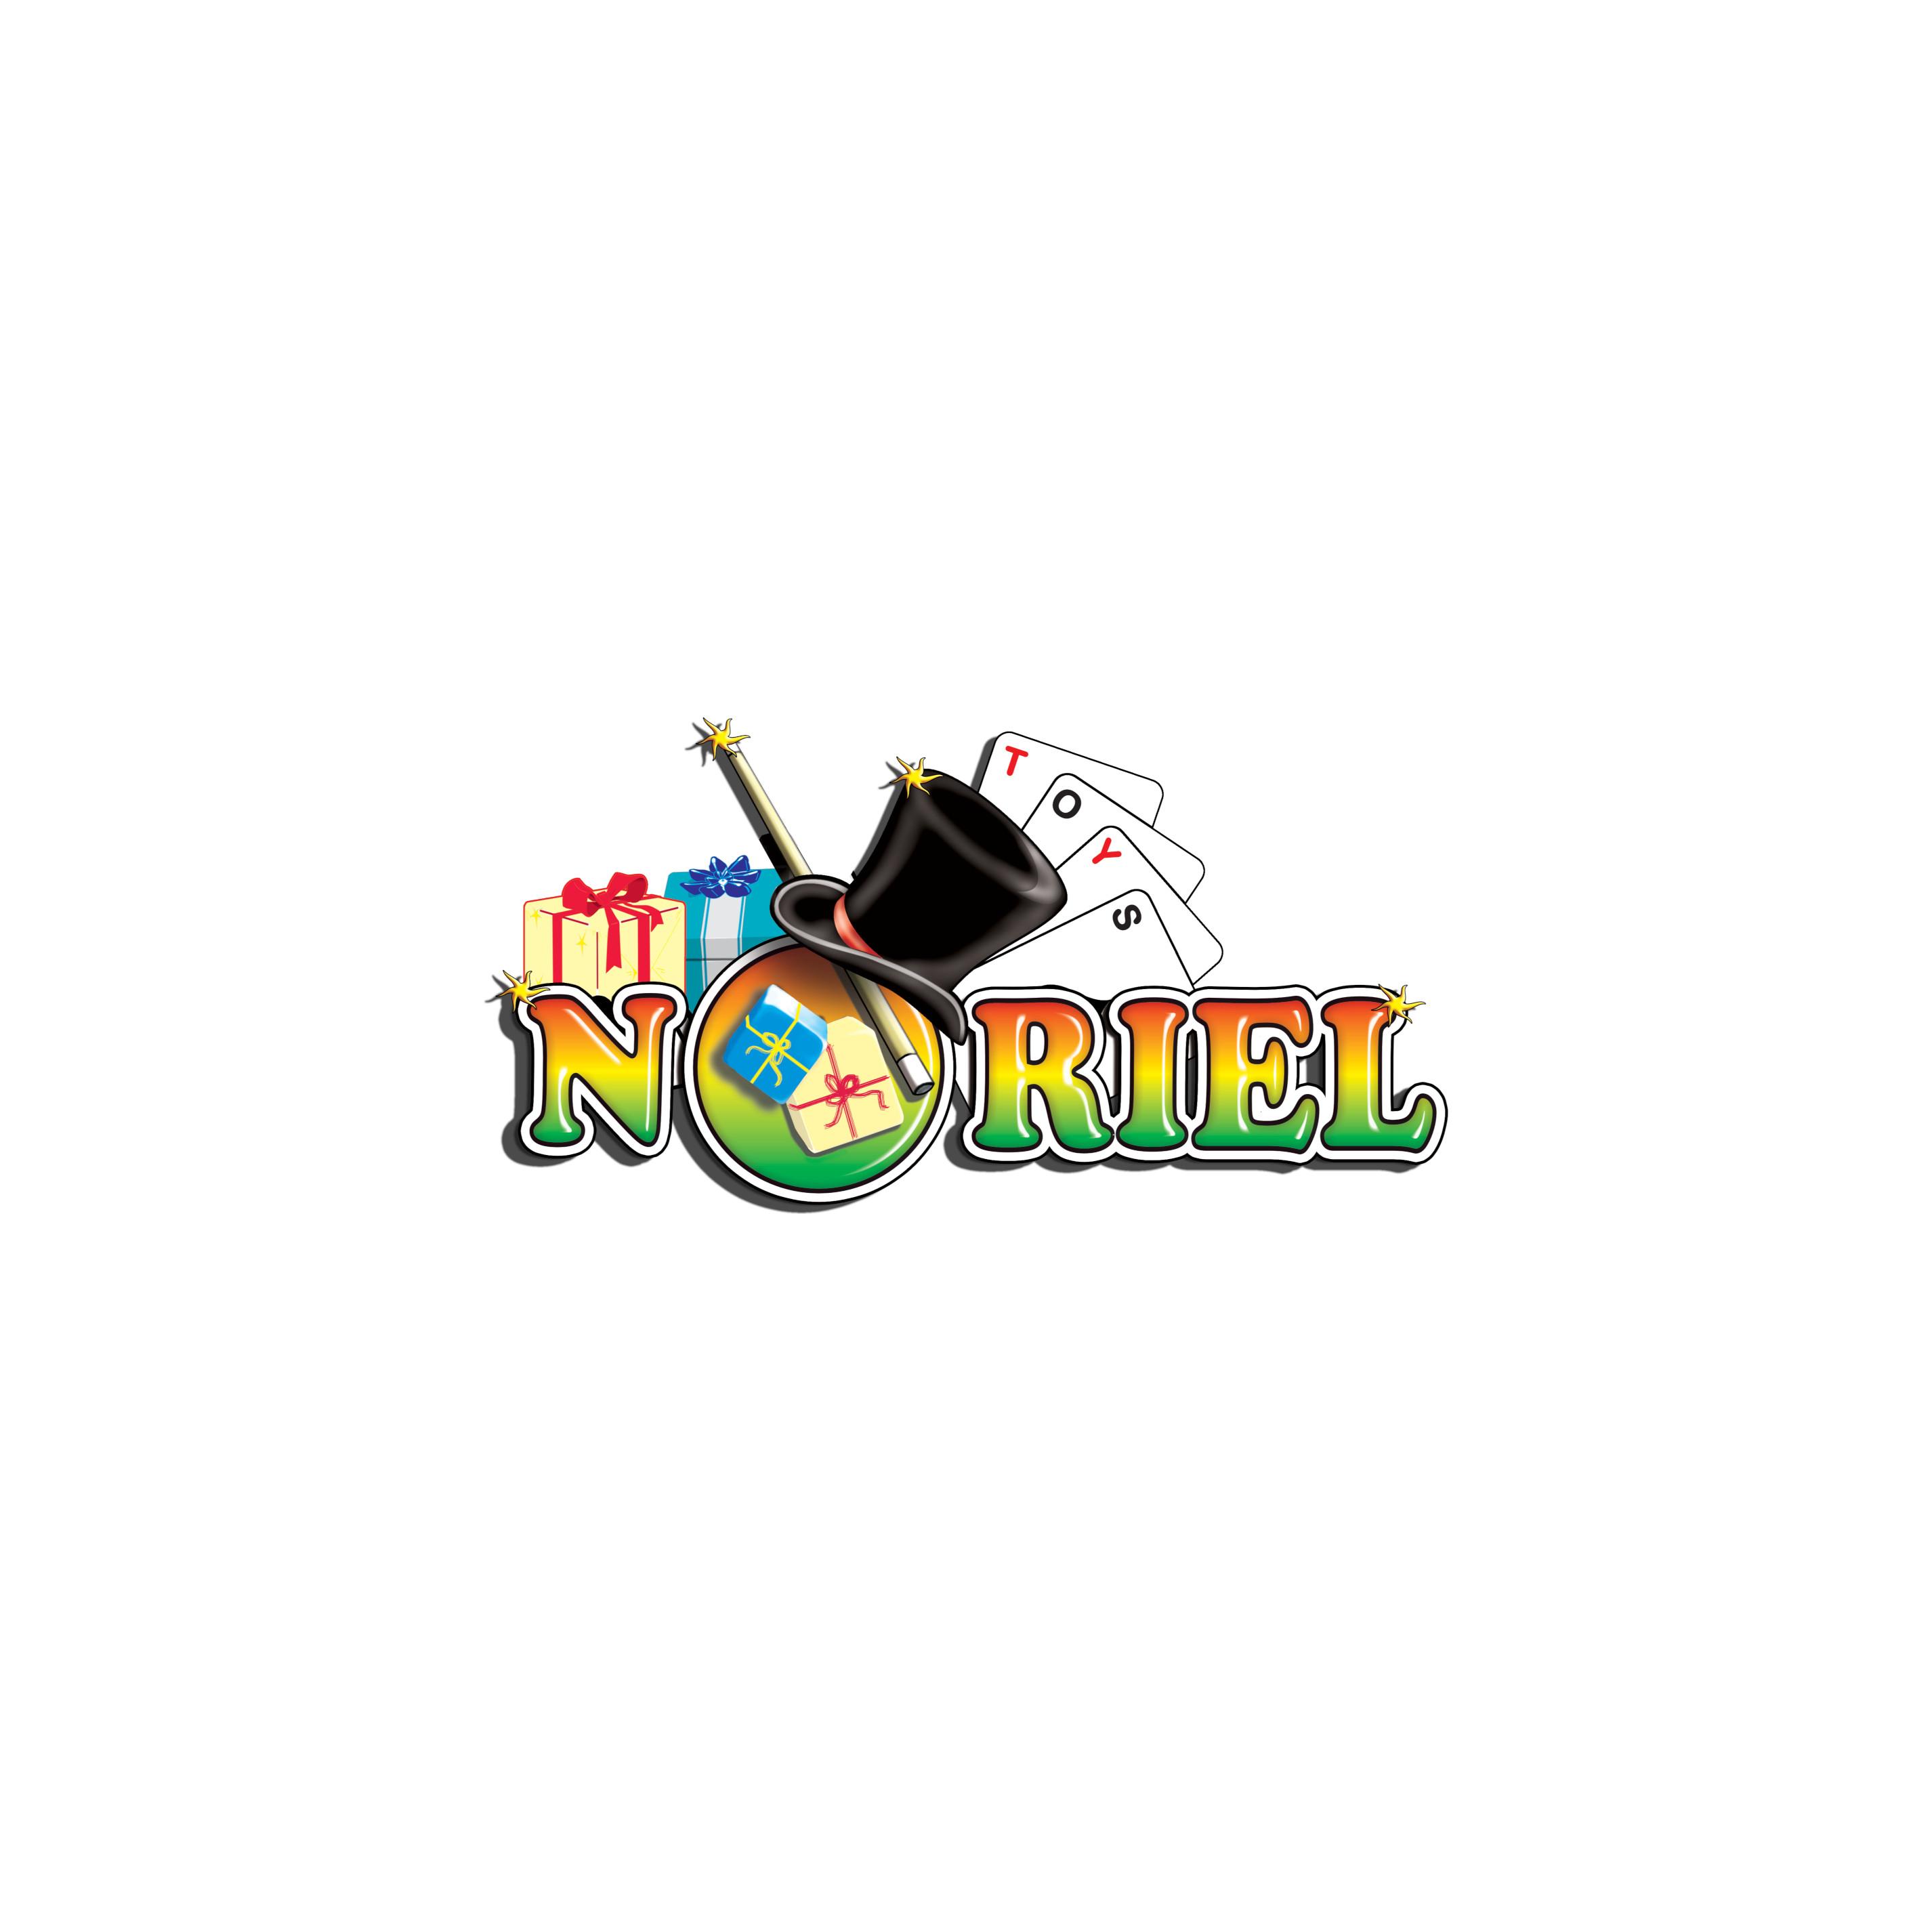 20201082_001 Ochelari de soare Toy Story